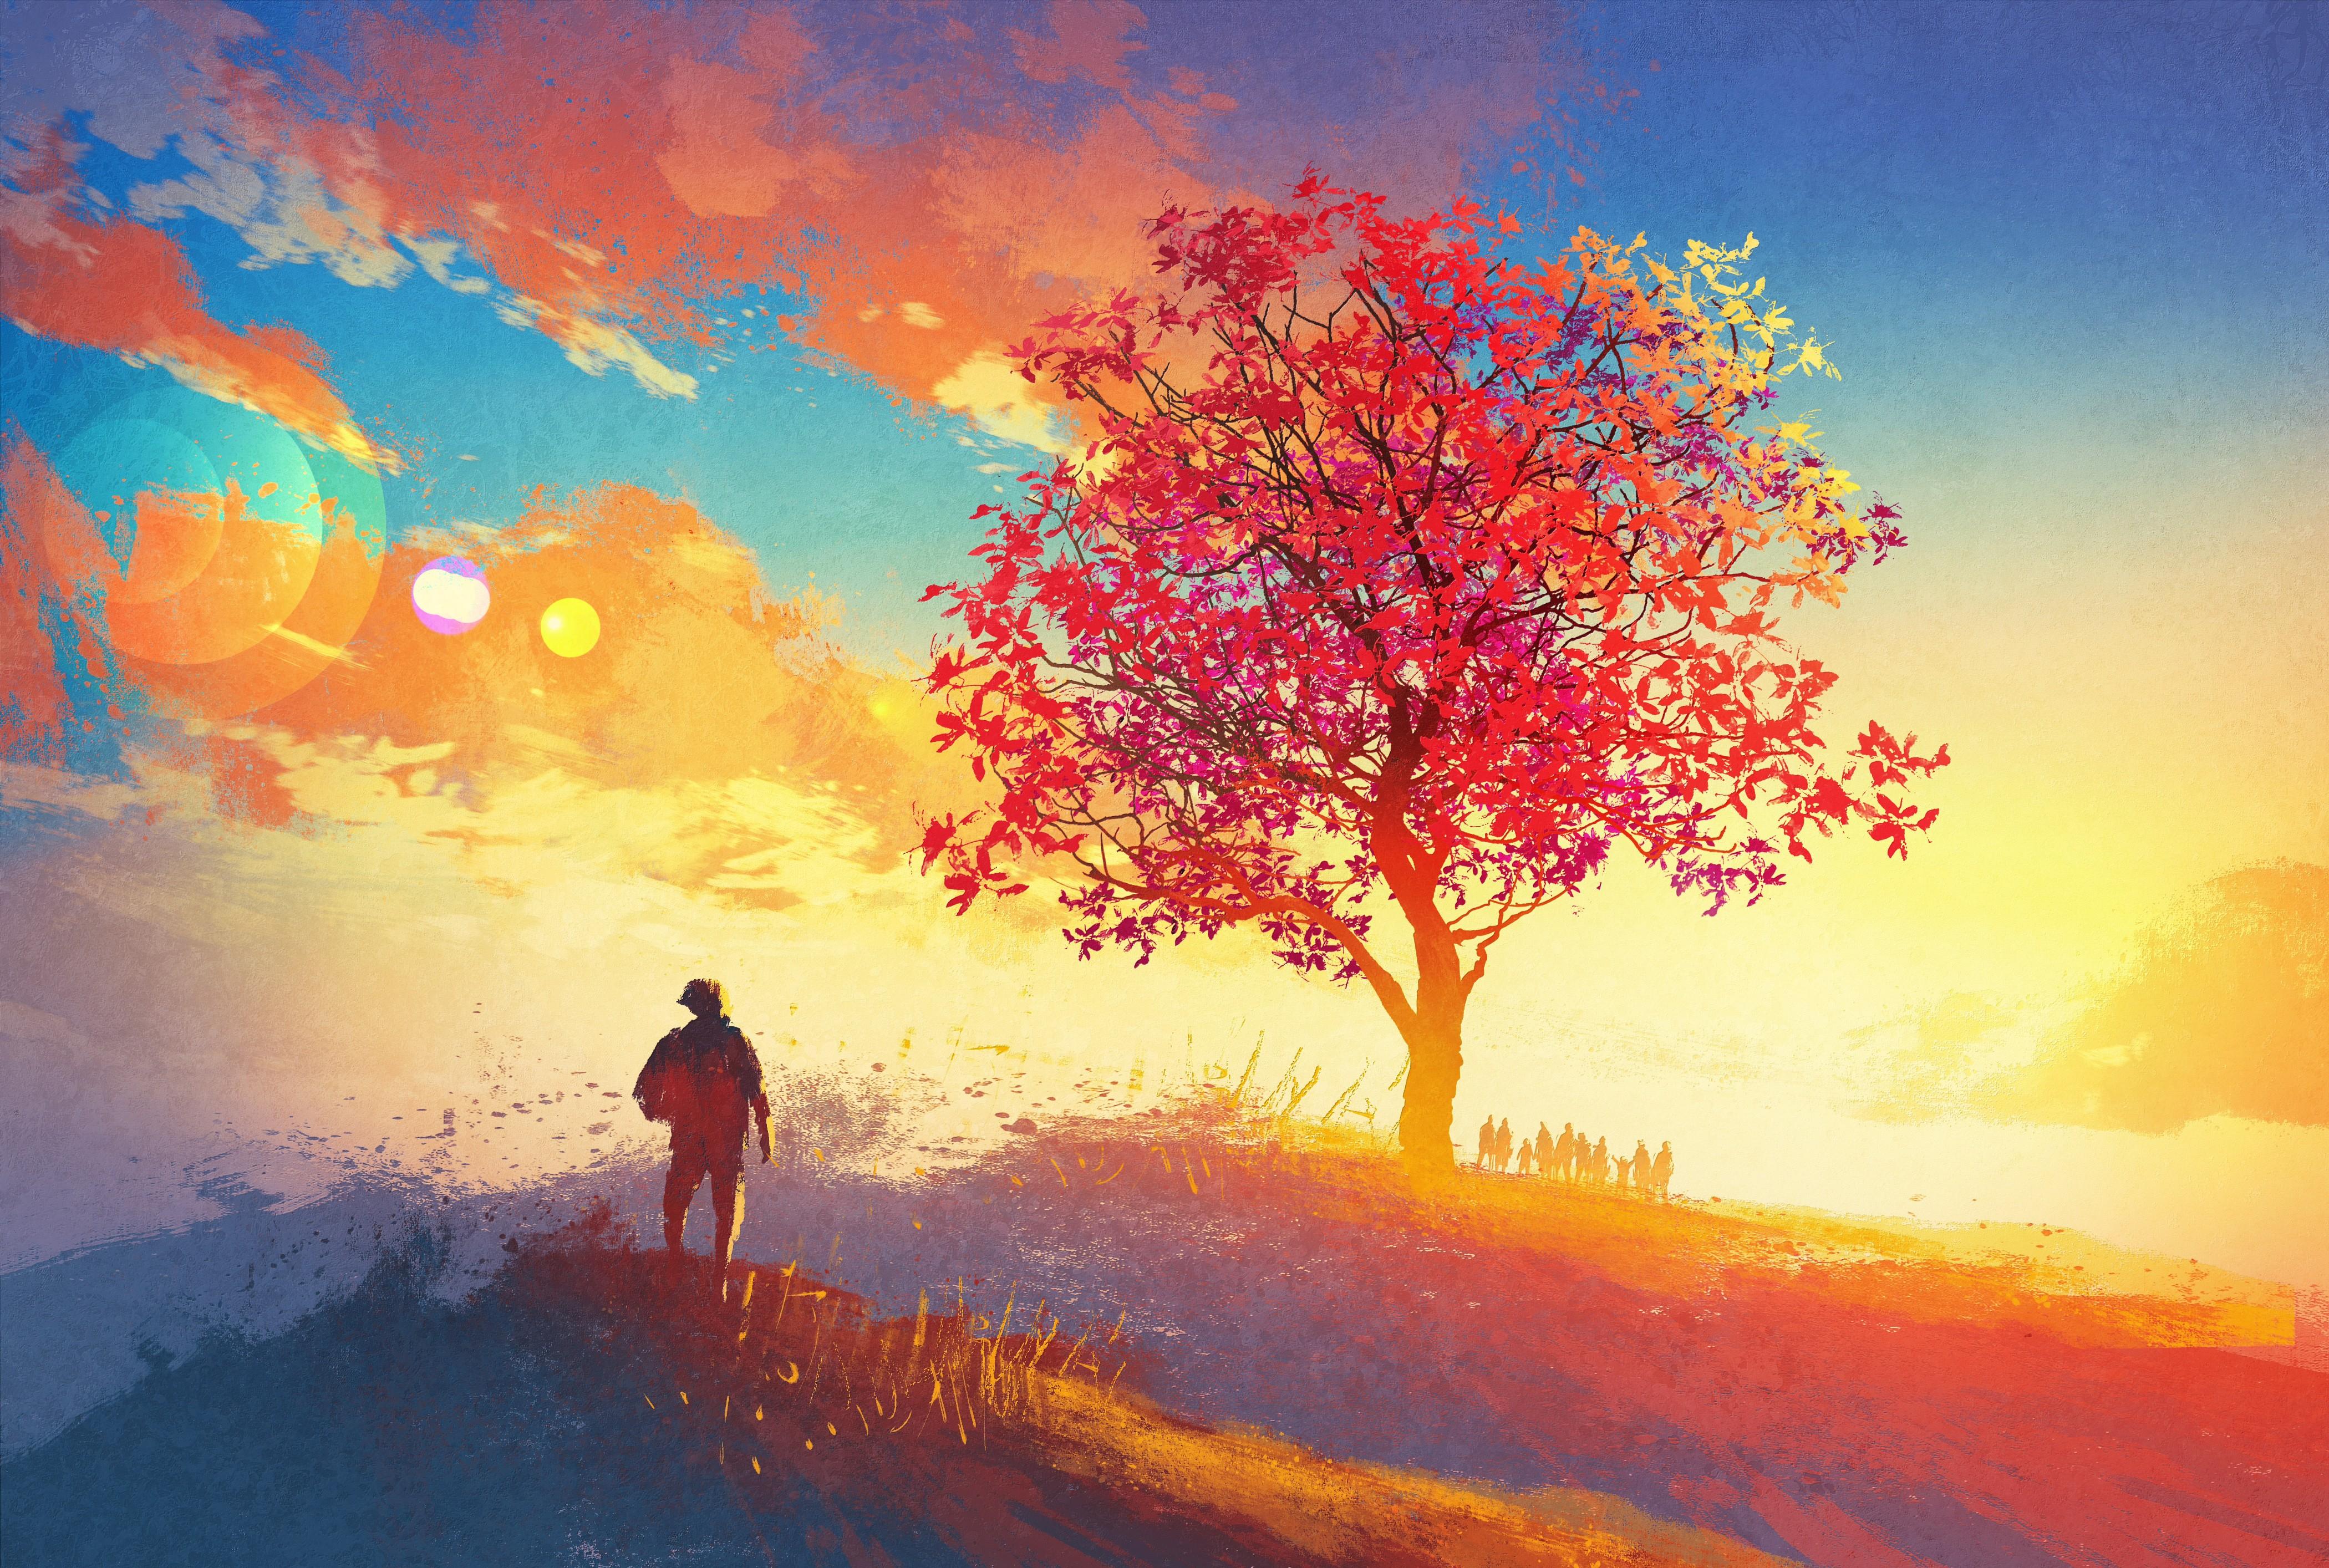 General 4200x2828 artwork colorful sunrise sky red leaves